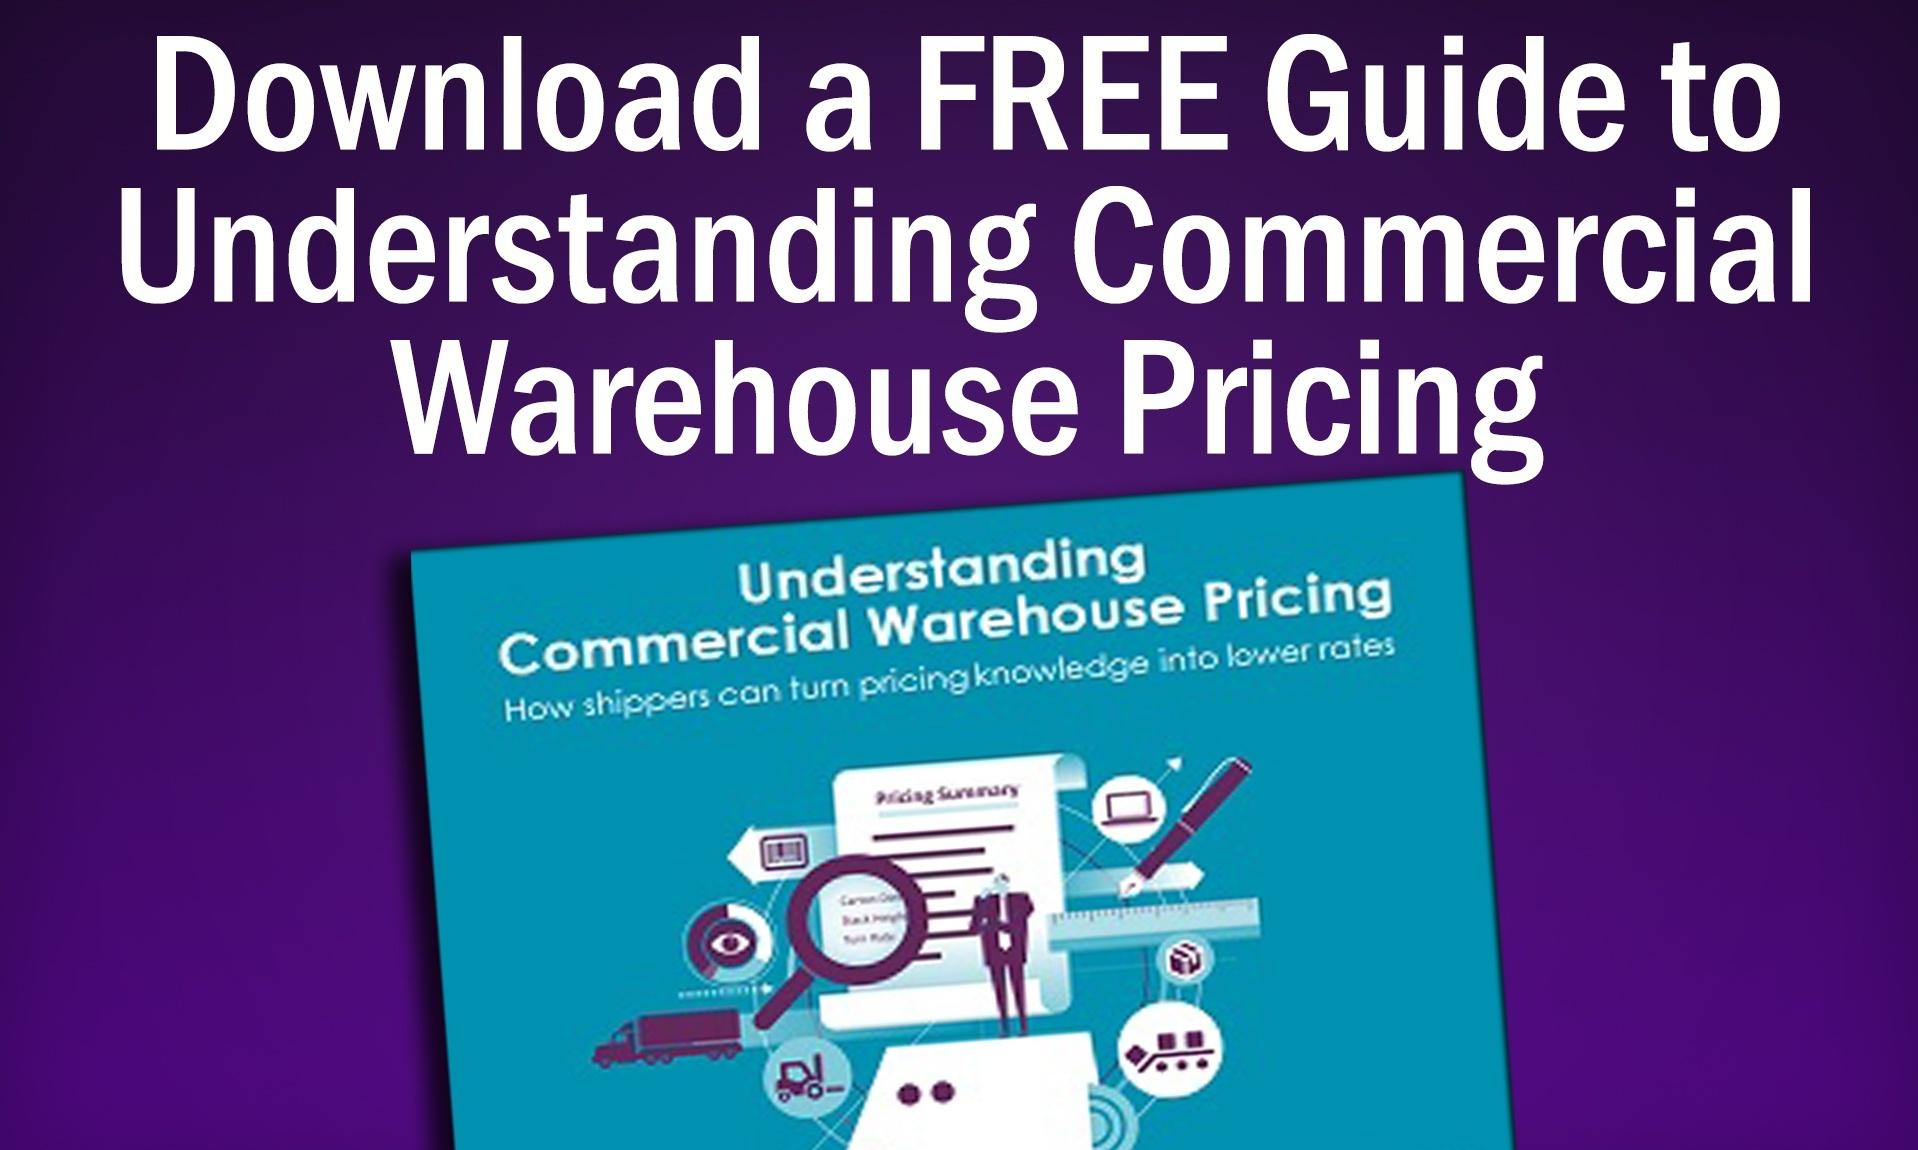 Pricing_Guide_Download.jpg